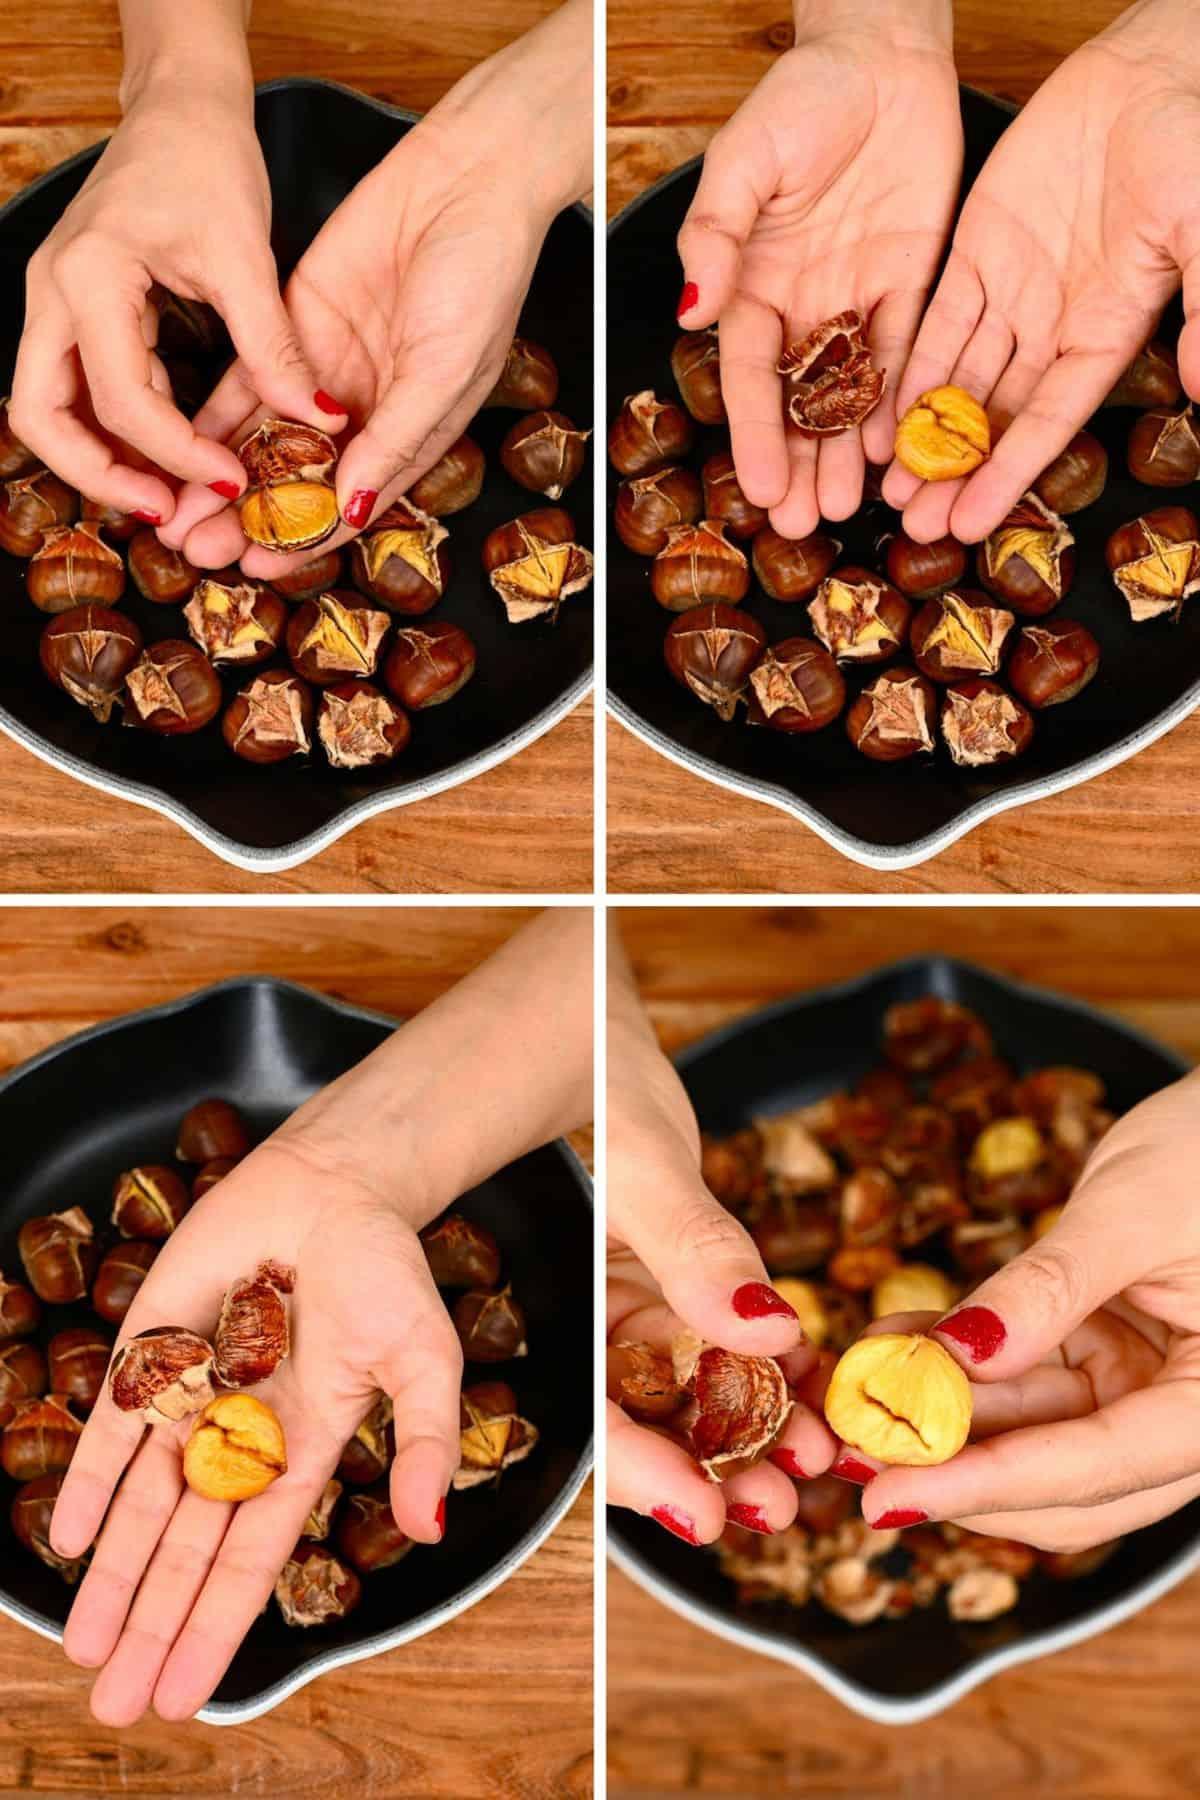 Steps for peeling roasted chestnuts